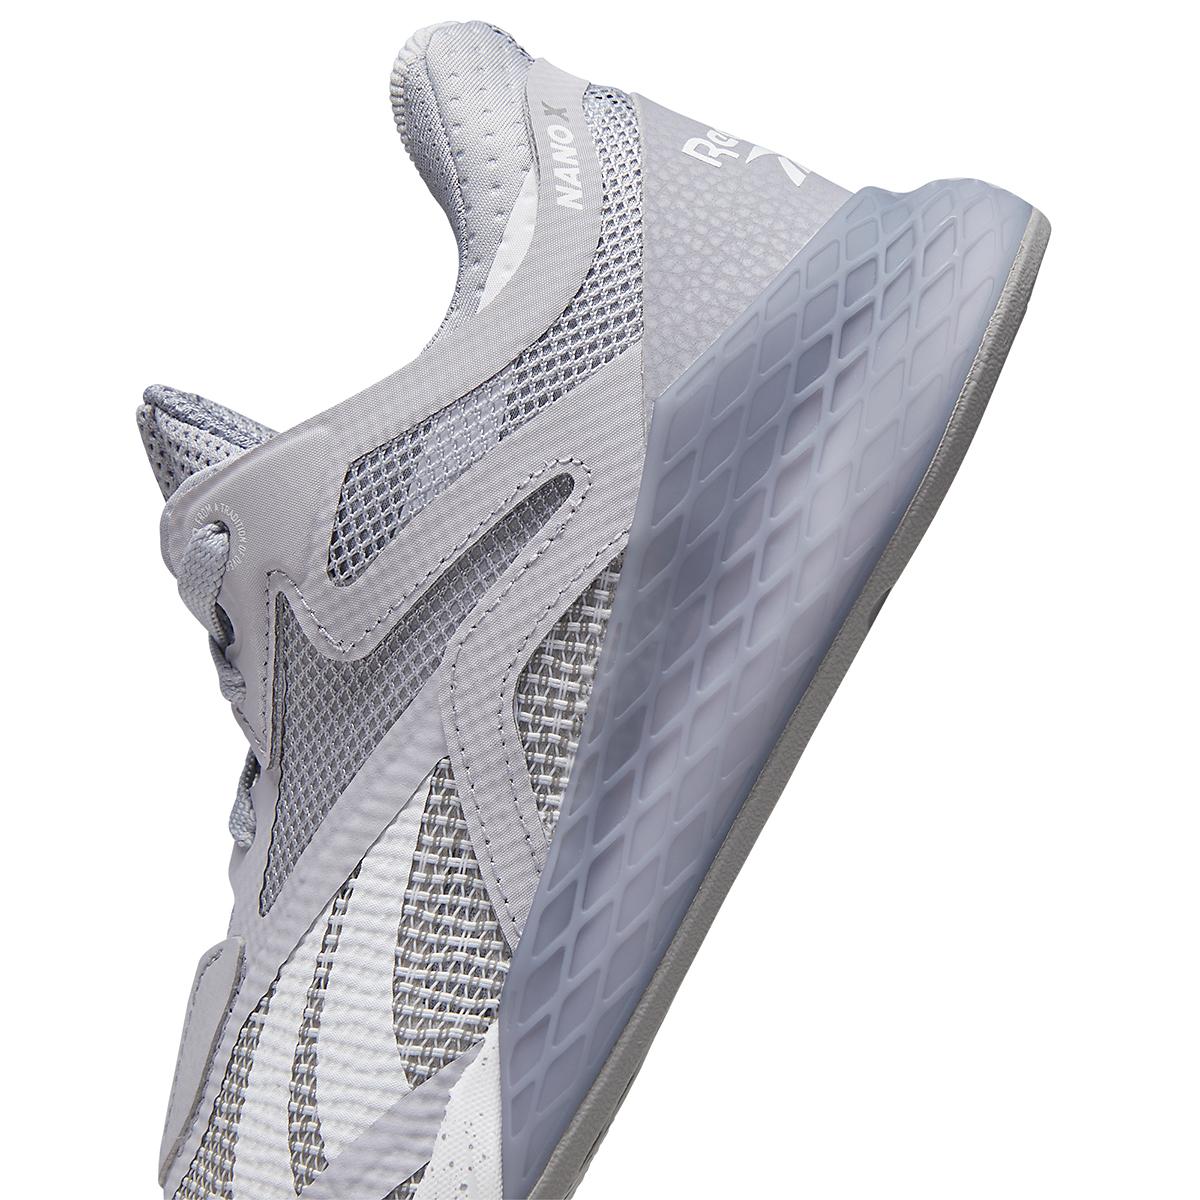 Women's Reebok Nano X Training Shoe - Color: Cold Grey/Cool Shadow/White - Size: 5 - Width: Regular, Cold Grey/Cool Shadow/White, large, image 5